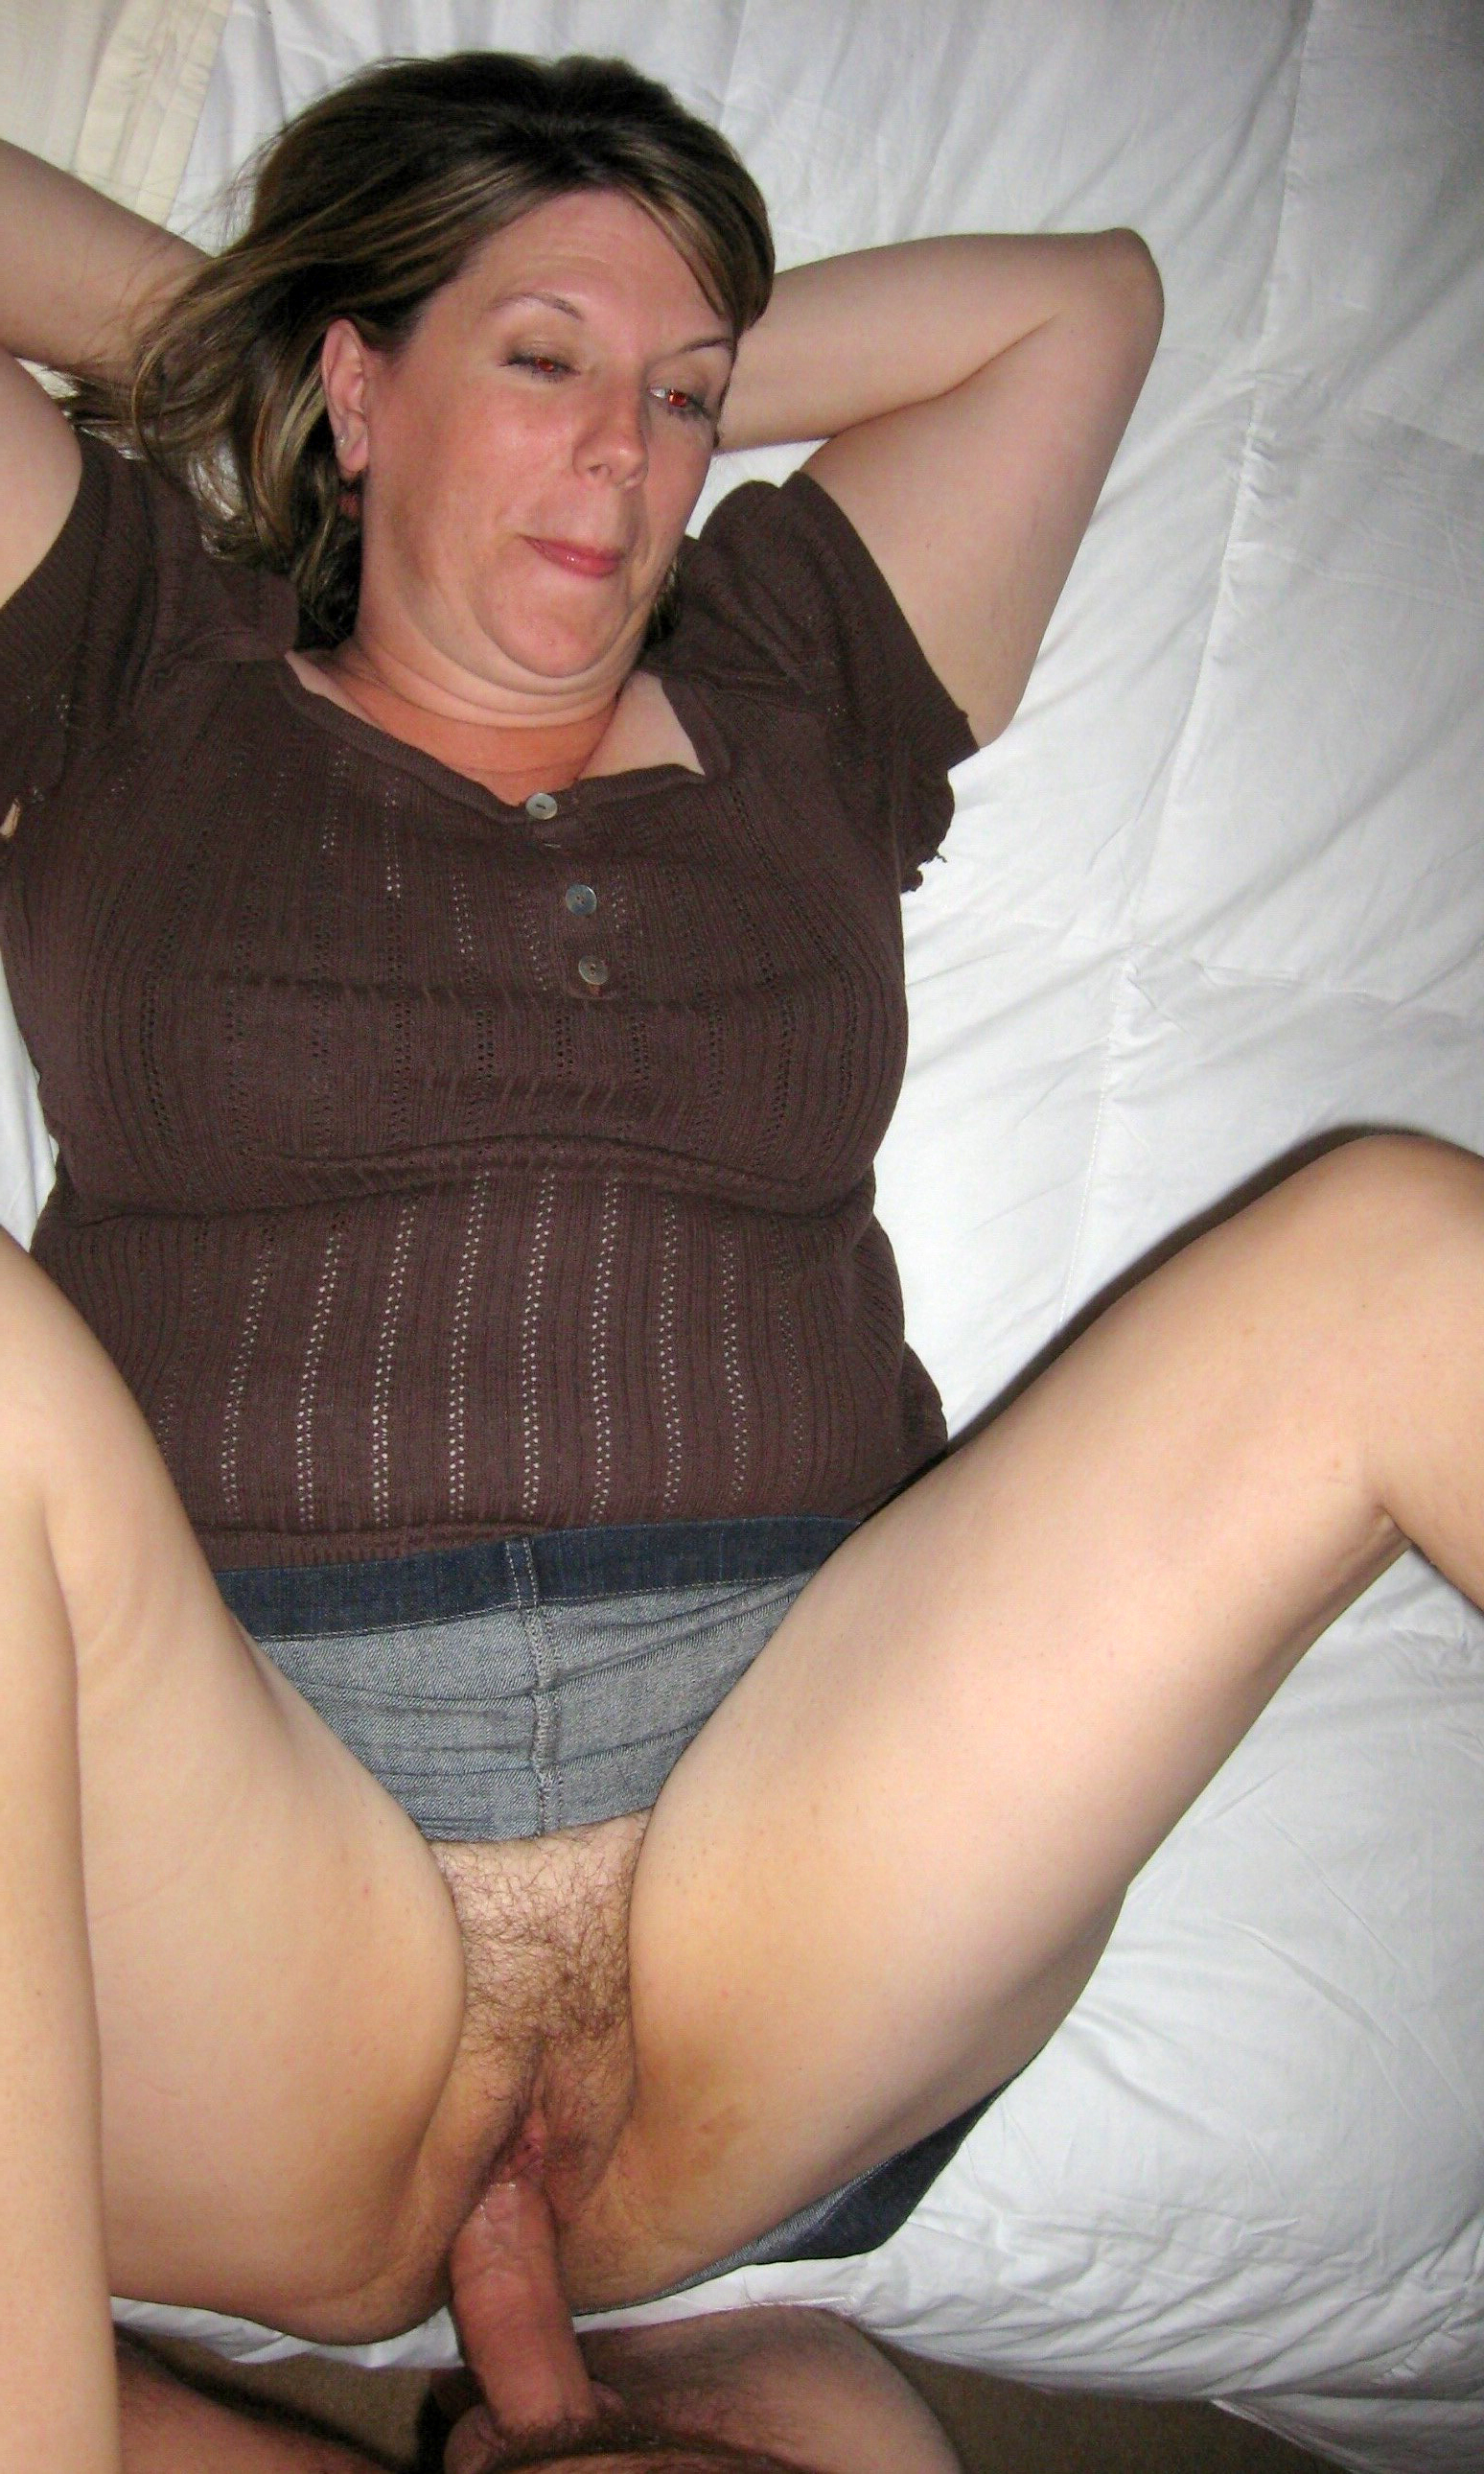 Pinay college couple nude photo leak